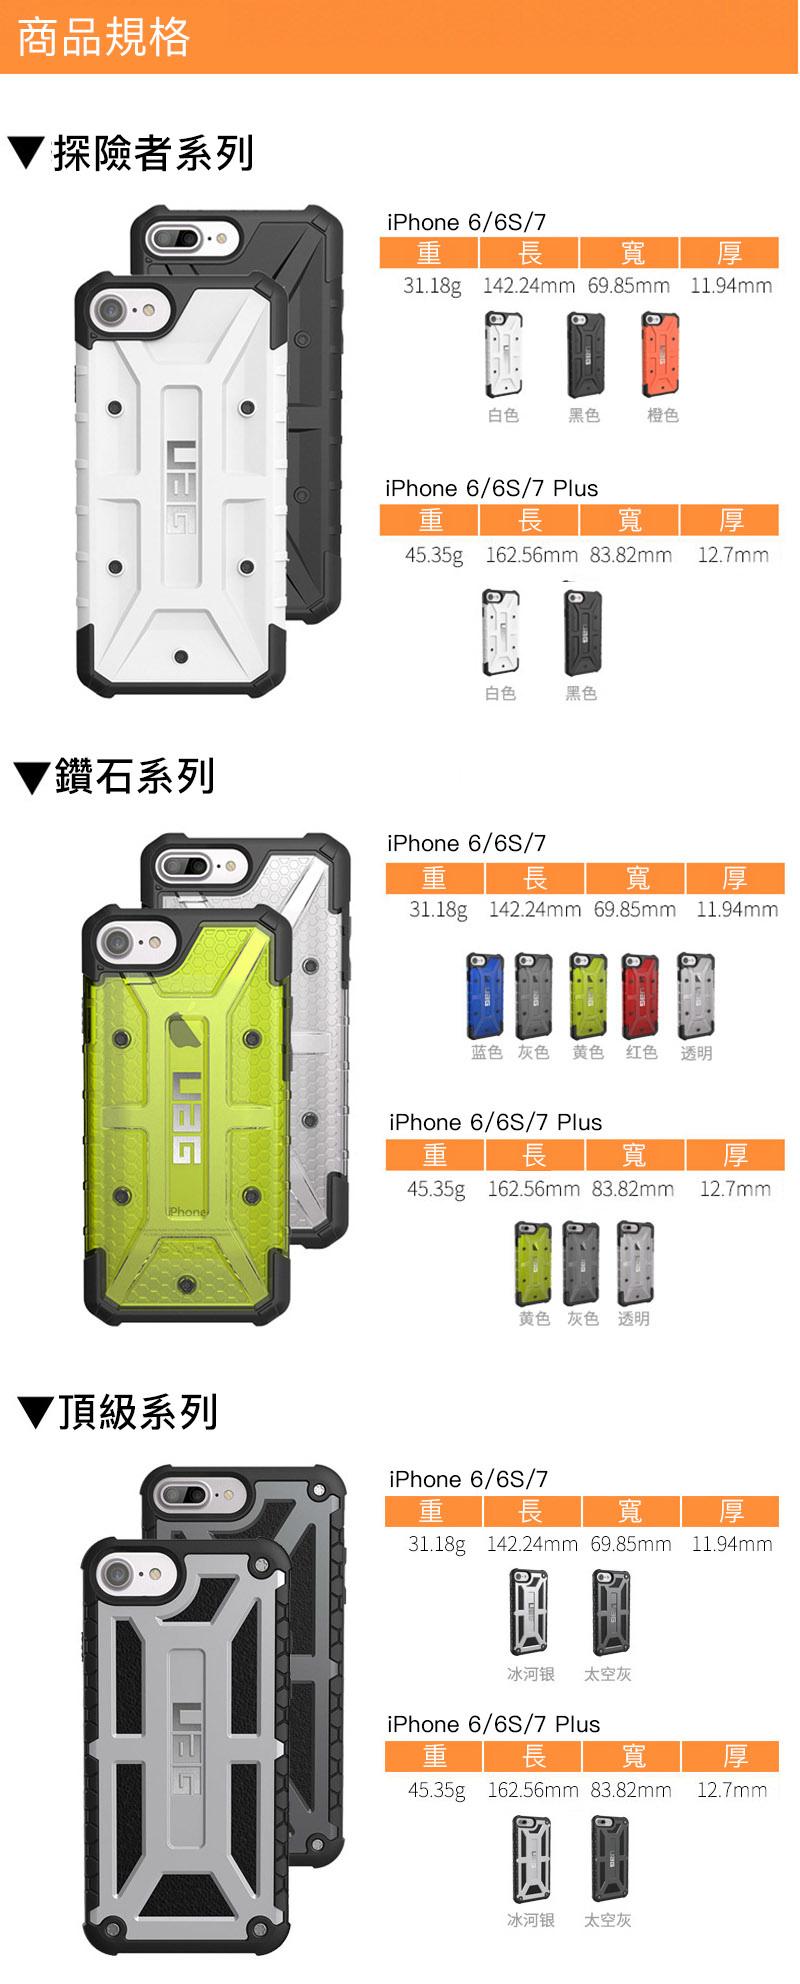 UAG美國城市裝甲耐衝擊保護殼 for iphone 6/6S/7 Plus